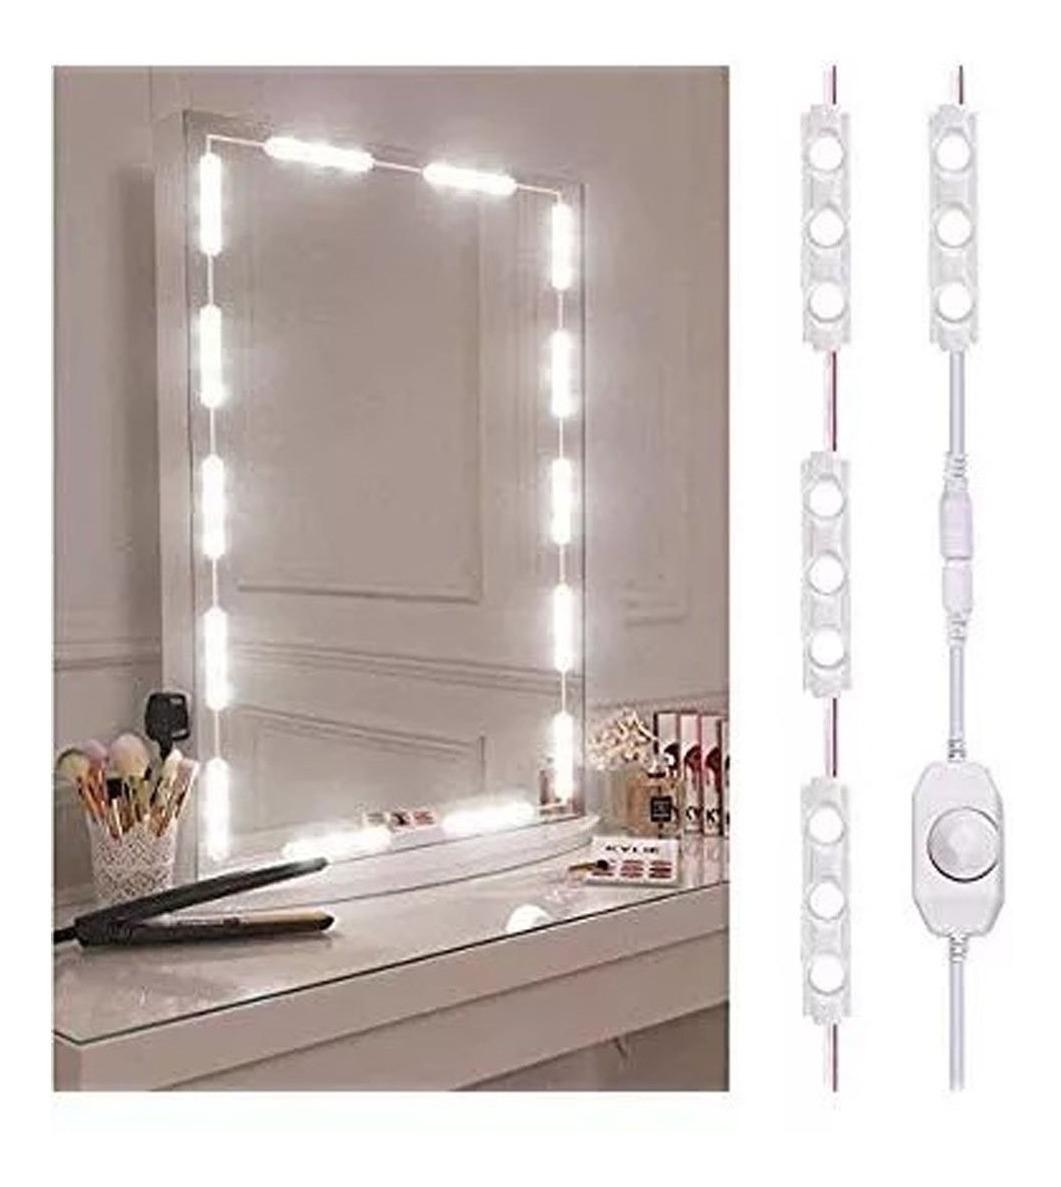 Kit De Luz Led Para Tu Espejo Maquillaje Fotografia Peinado Estilo  Hollywood Para Estudio Oficina Cuarto Baño Belleza